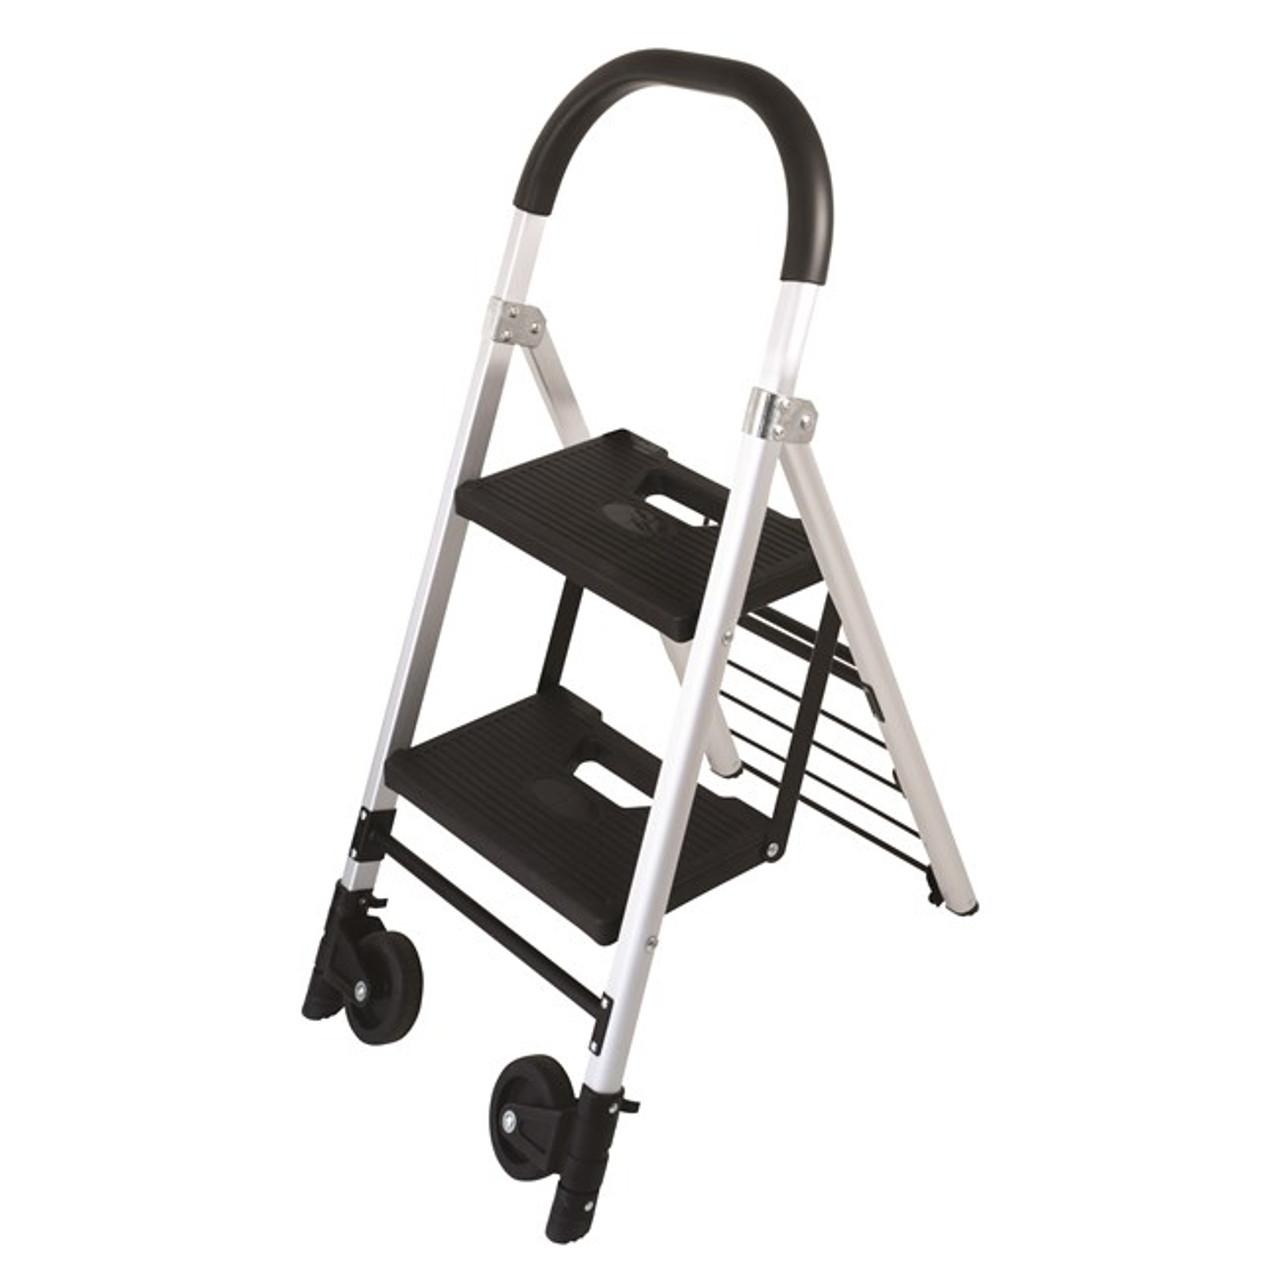 Surprising Durus 100852030 Folding 2 Step Ladder Trolley Lamtechconsult Wood Chair Design Ideas Lamtechconsultcom